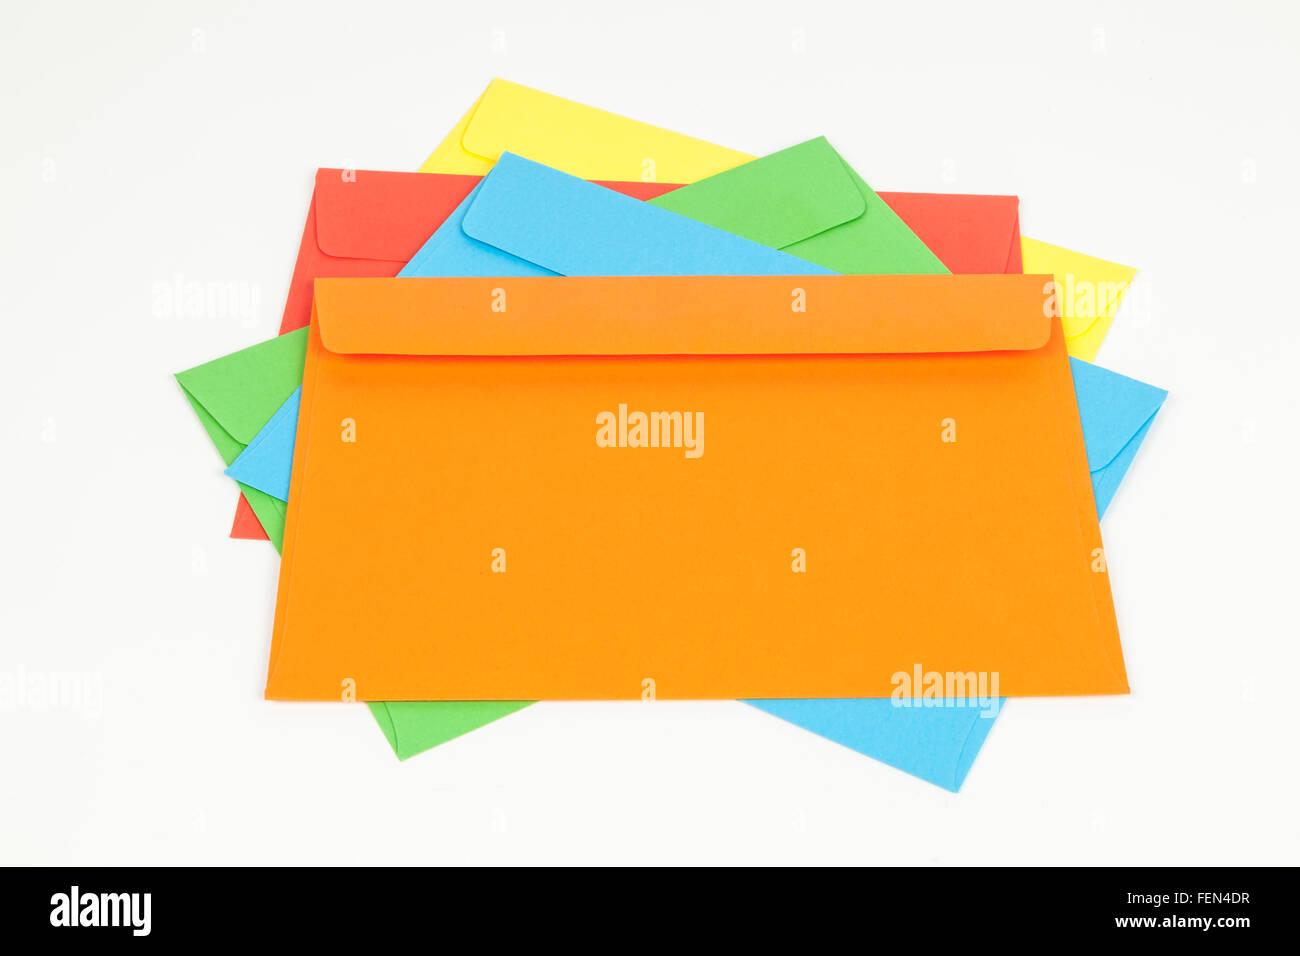 Stack of envelopes - Stock Image